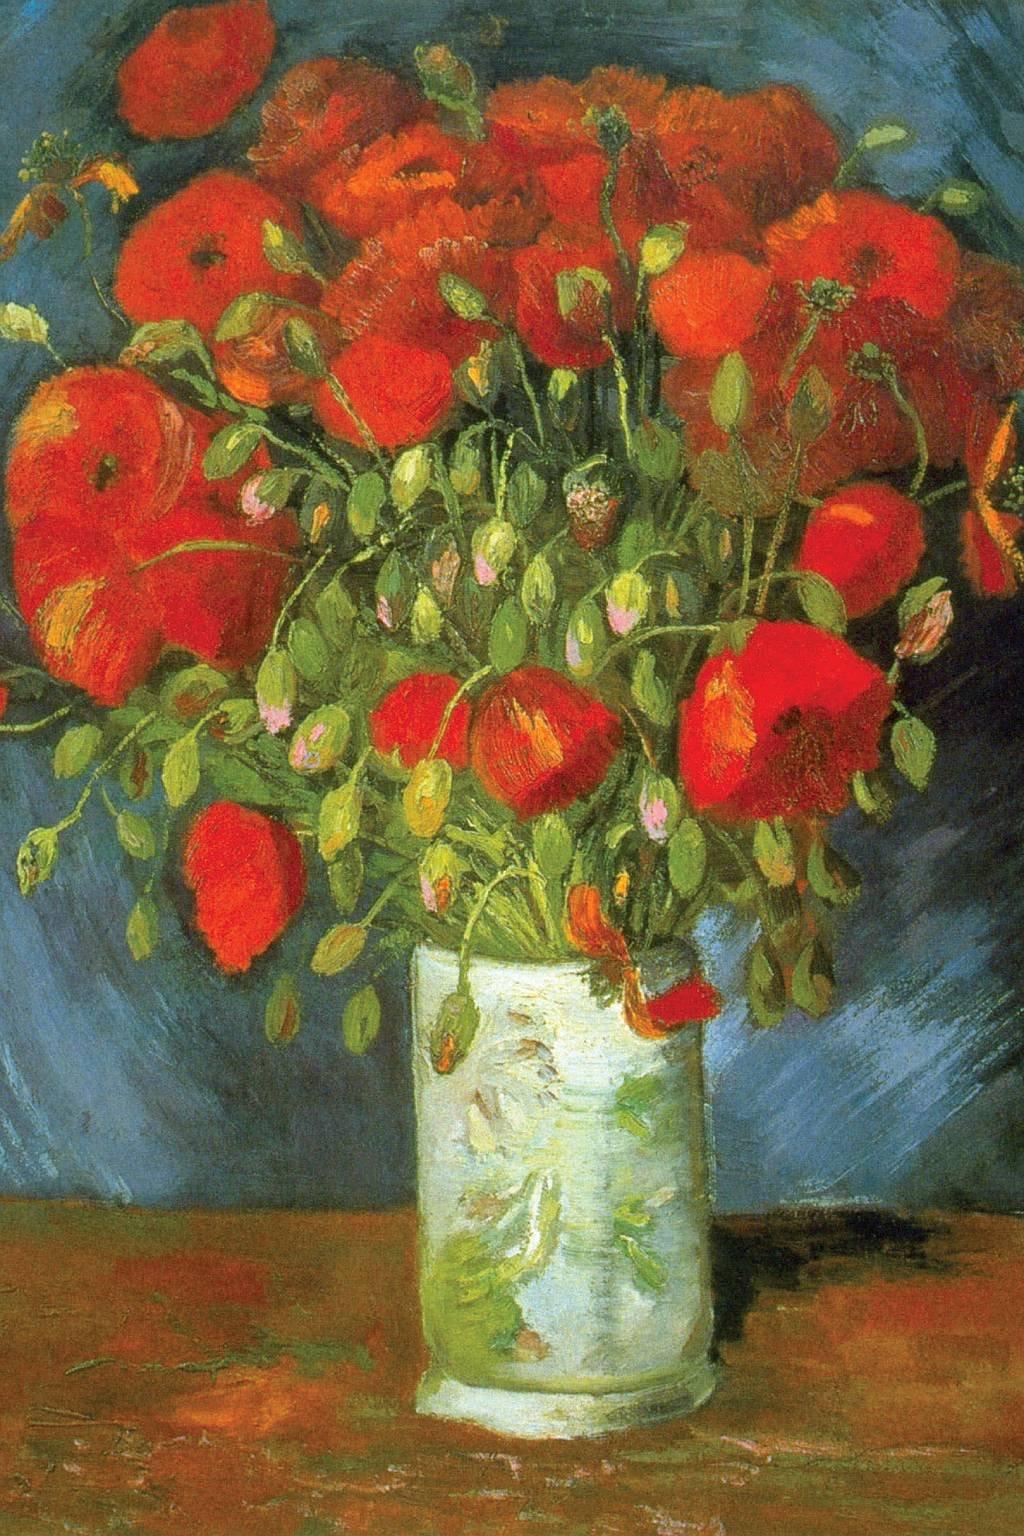 Amapolas rojas. Vincent van Gogh, 1880.